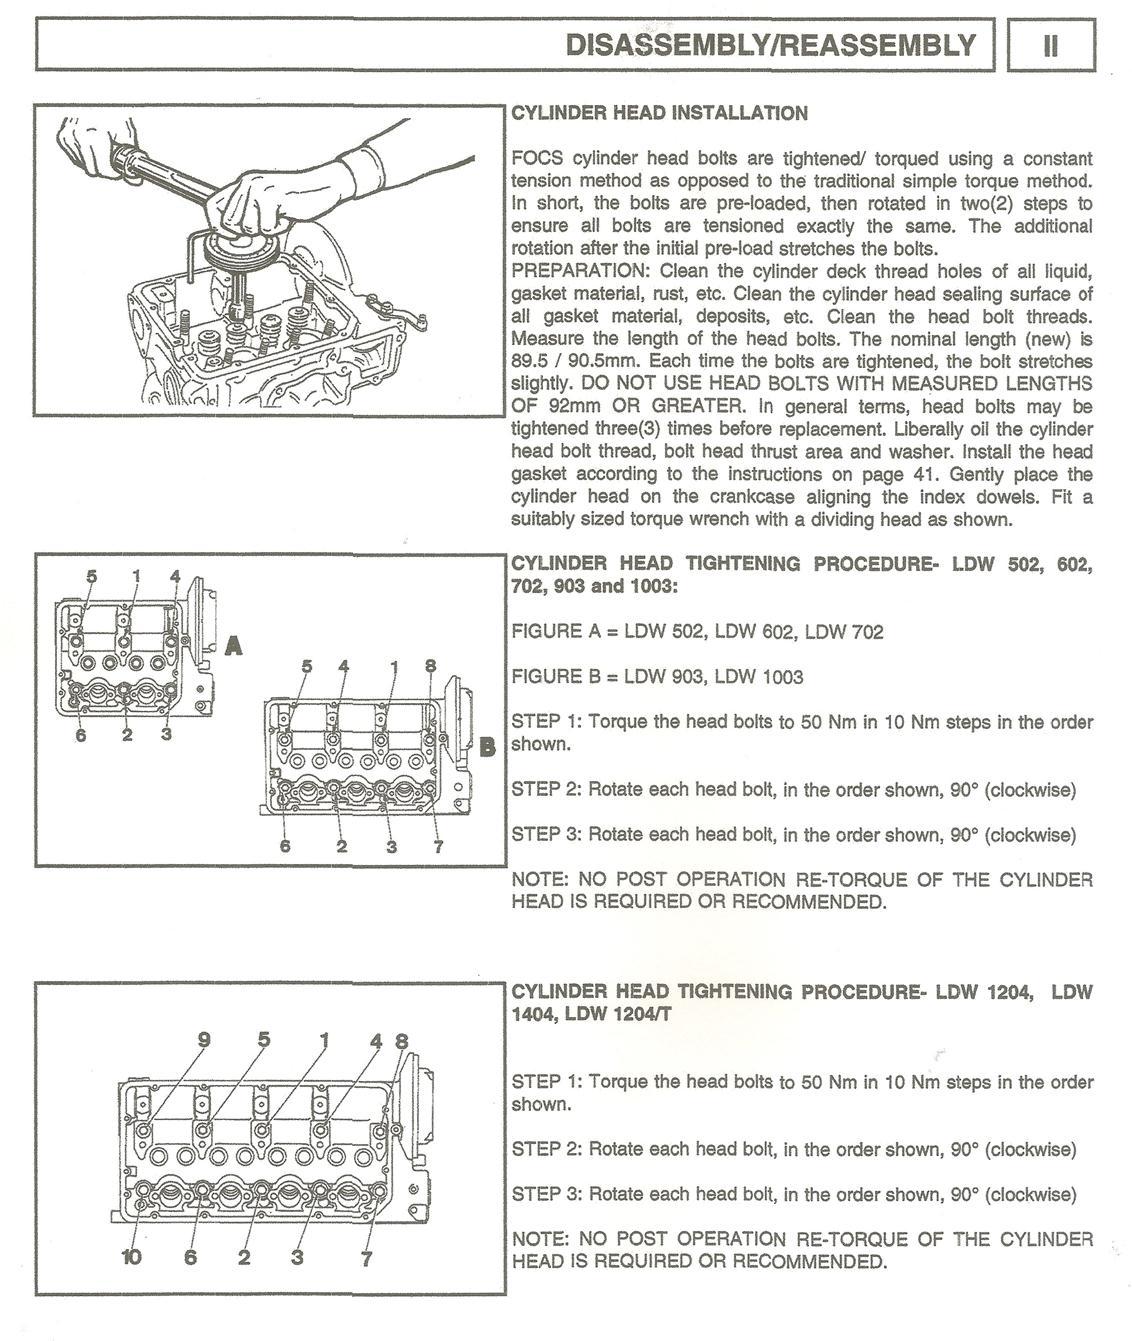 kubota dynamo wiring diagram indexnewspaper com. Black Bedroom Furniture Sets. Home Design Ideas